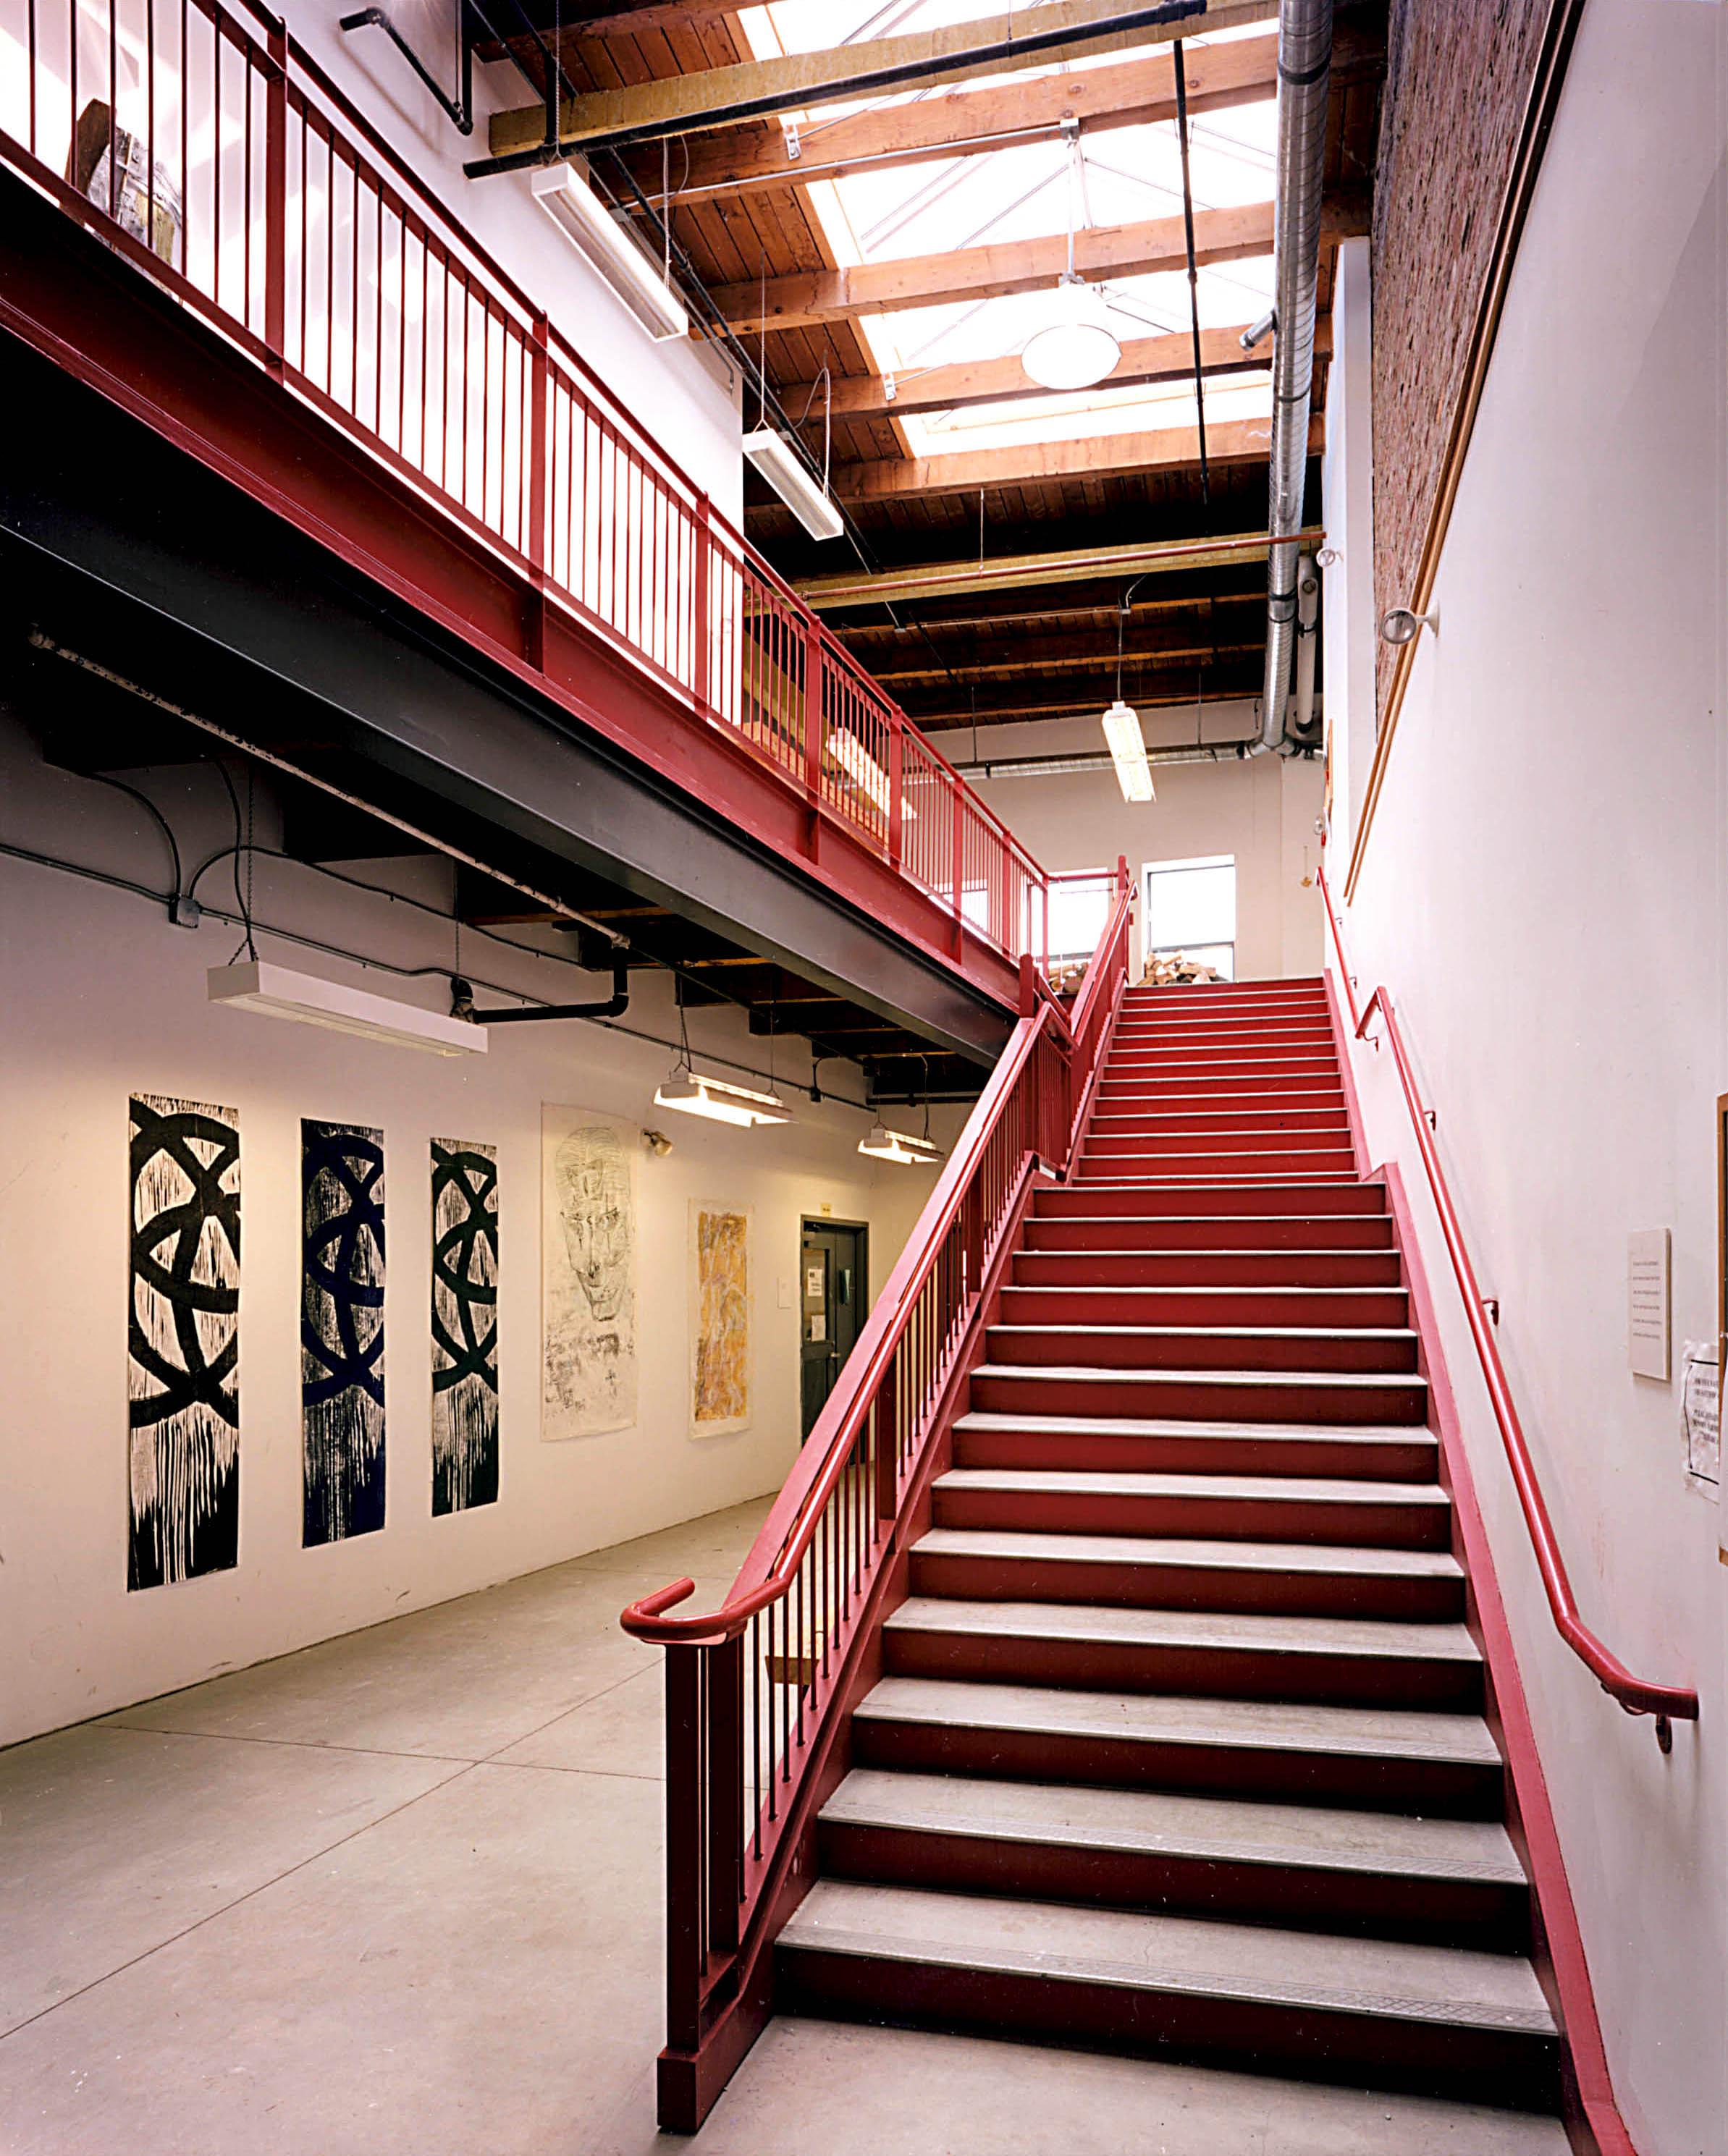 MECA 3 upper level stair_7a3f1c9d.jpg